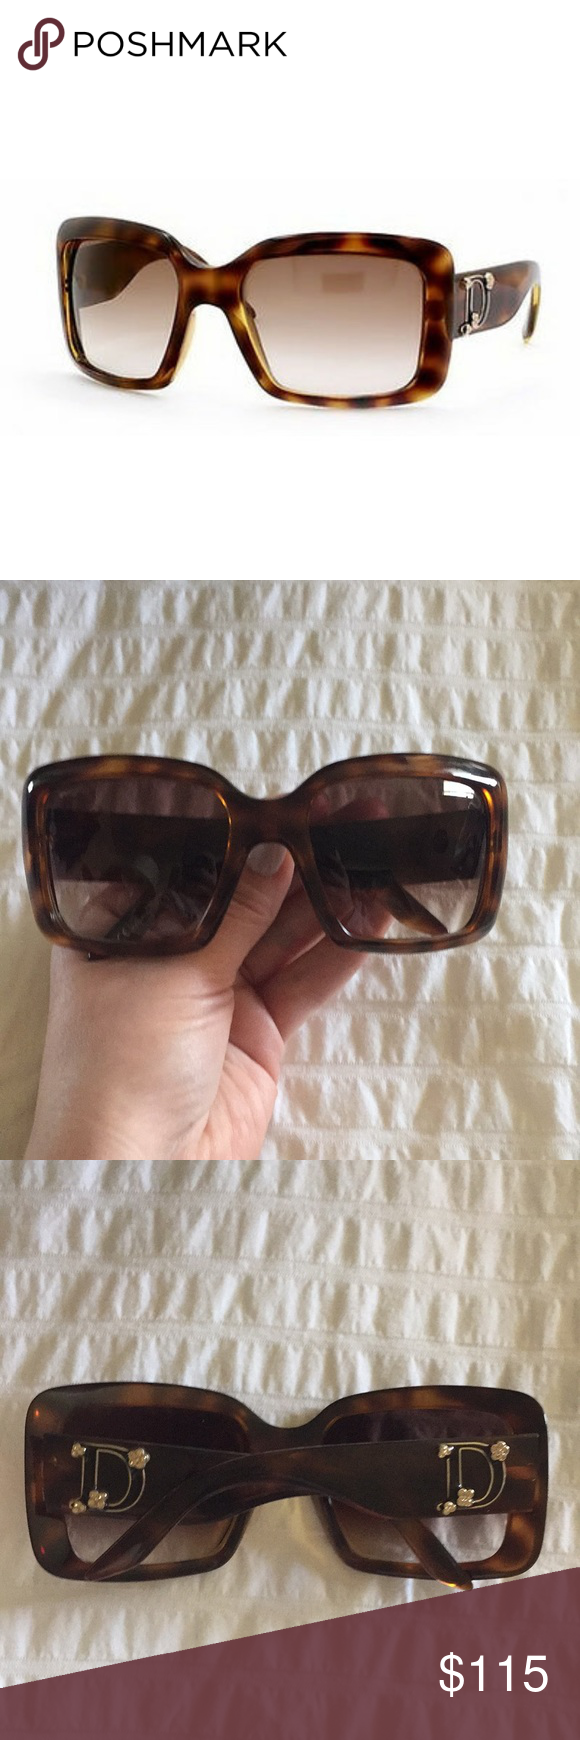 2a167e755de8 Christian Dior Sunglasses Lightly used Dior sunglasses. Dior Couture 1  583S2 57•20 130; tortoise shell sunglasses with embellished